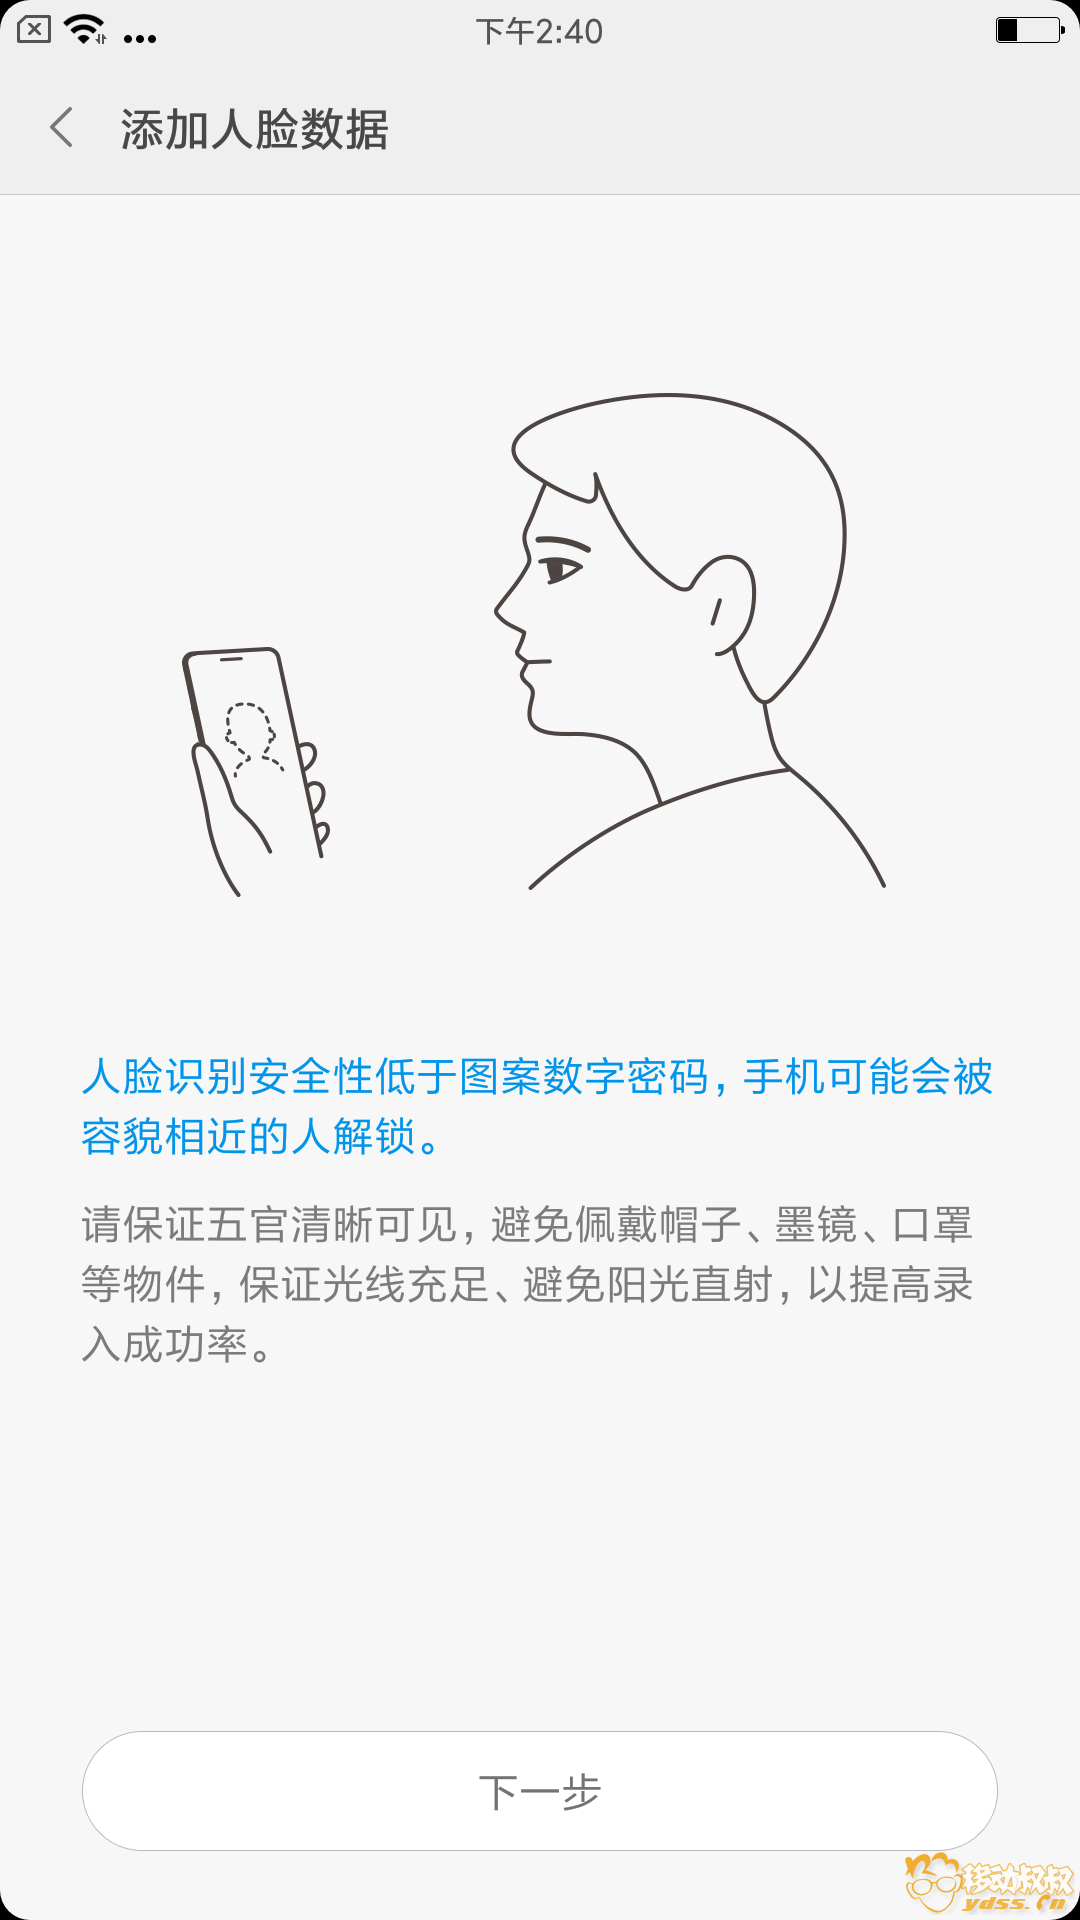 Screenshot_2018-04-06-14-40-30-389_com.android.keyguard.png